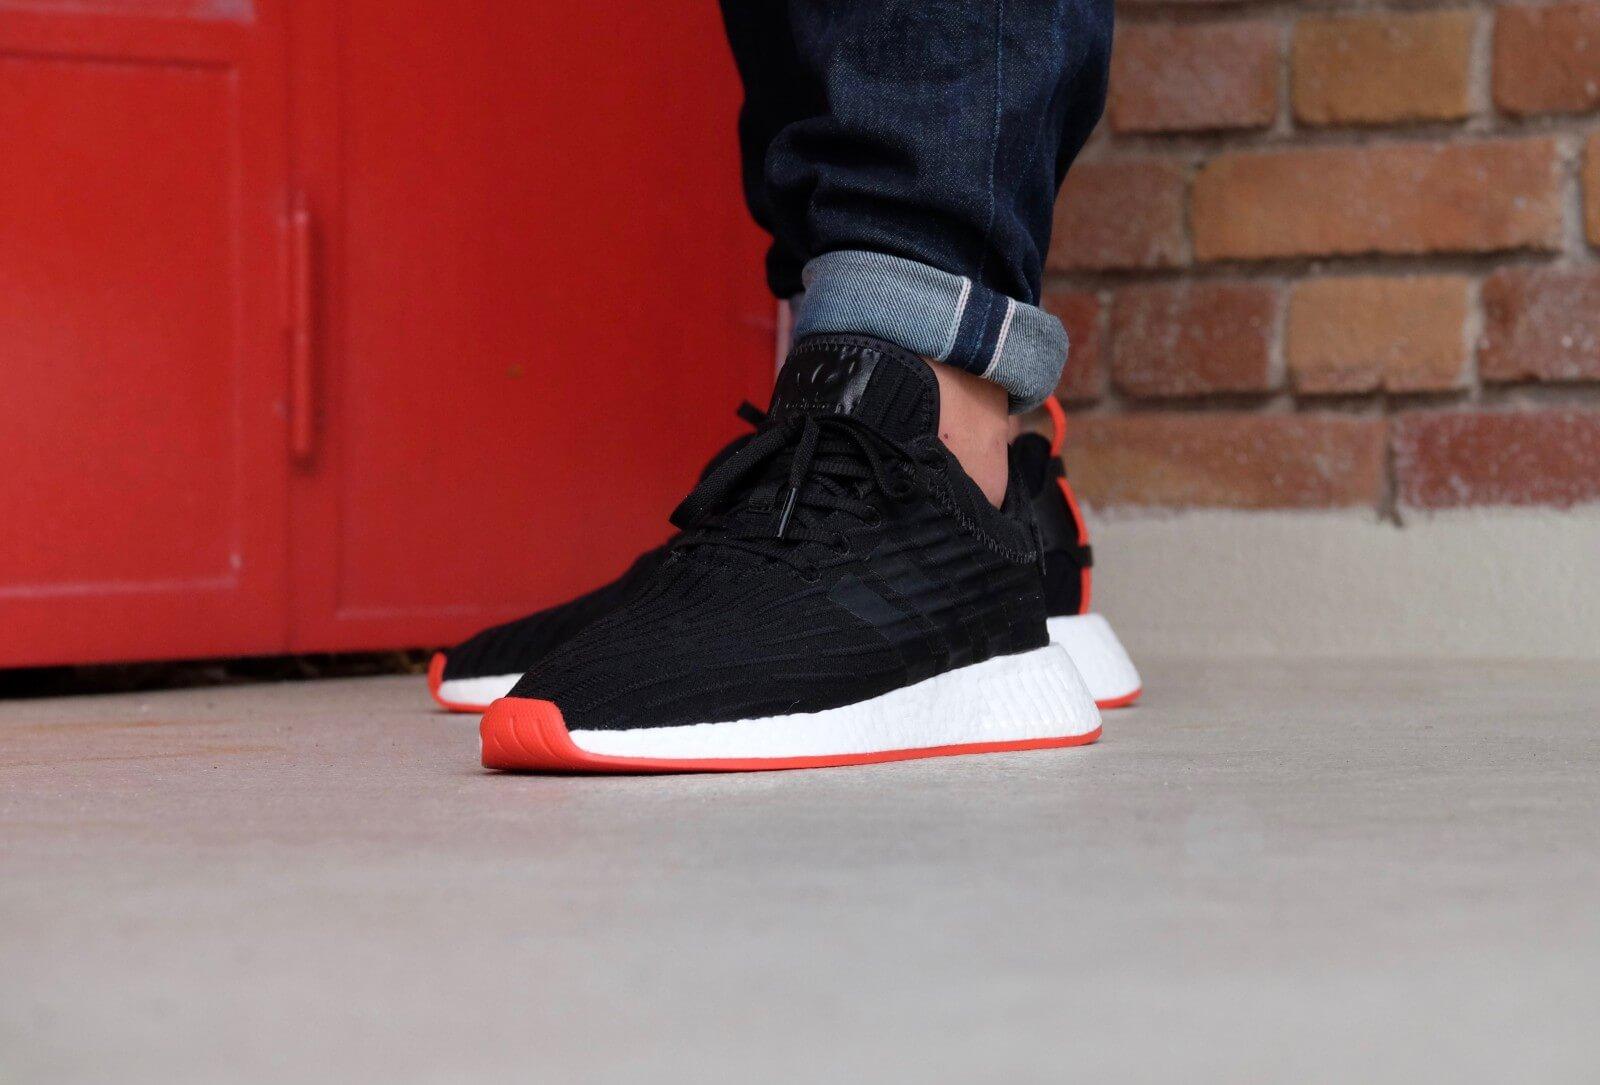 adidas nmd r2 black red